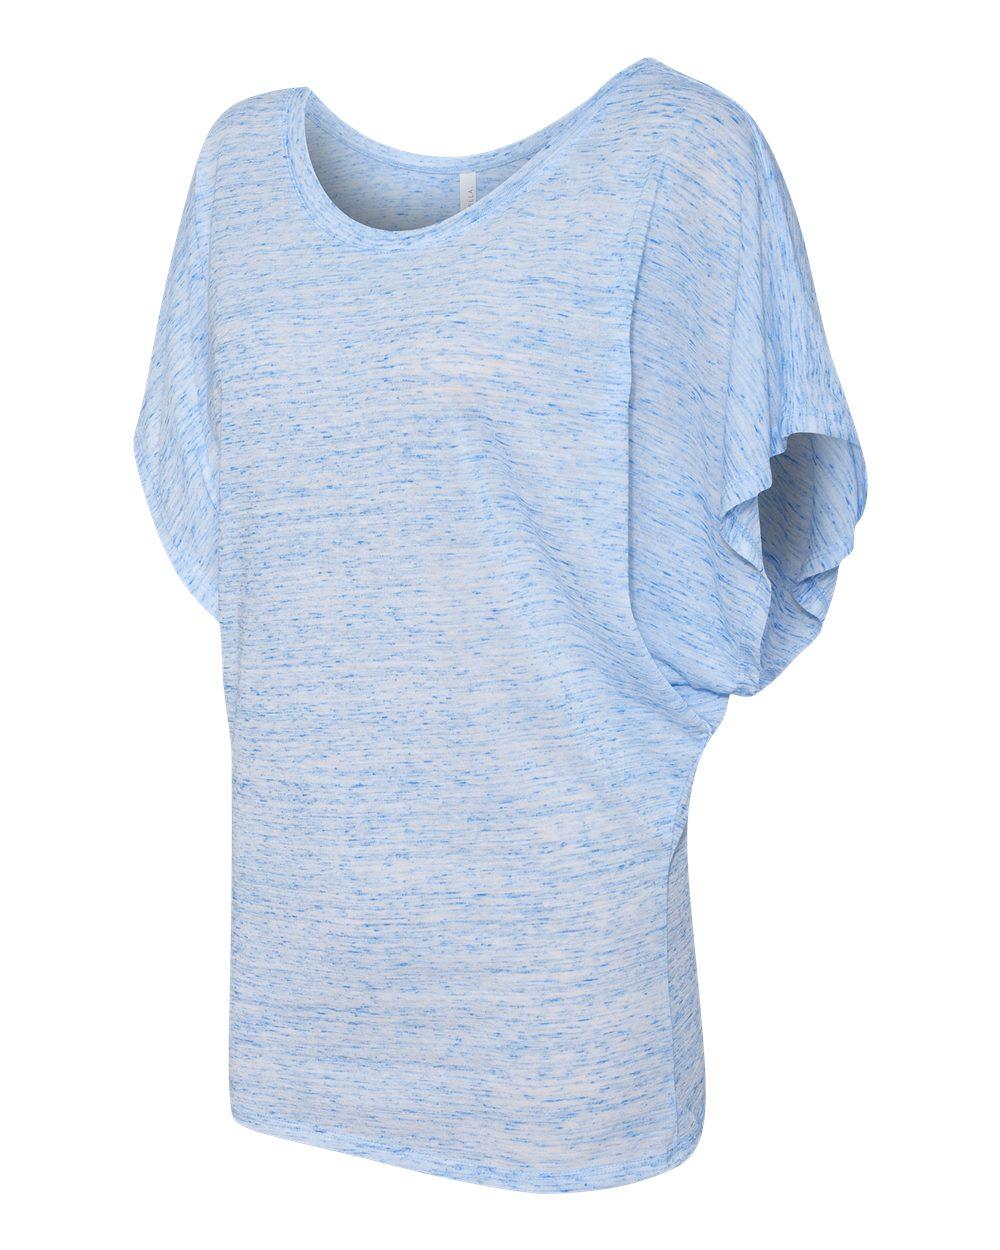 Bella-Canvas-Women-039-s-Flowy-Draped-Sleeve-Dolman-T-Shirt-8821-S-2XL thumbnail 18